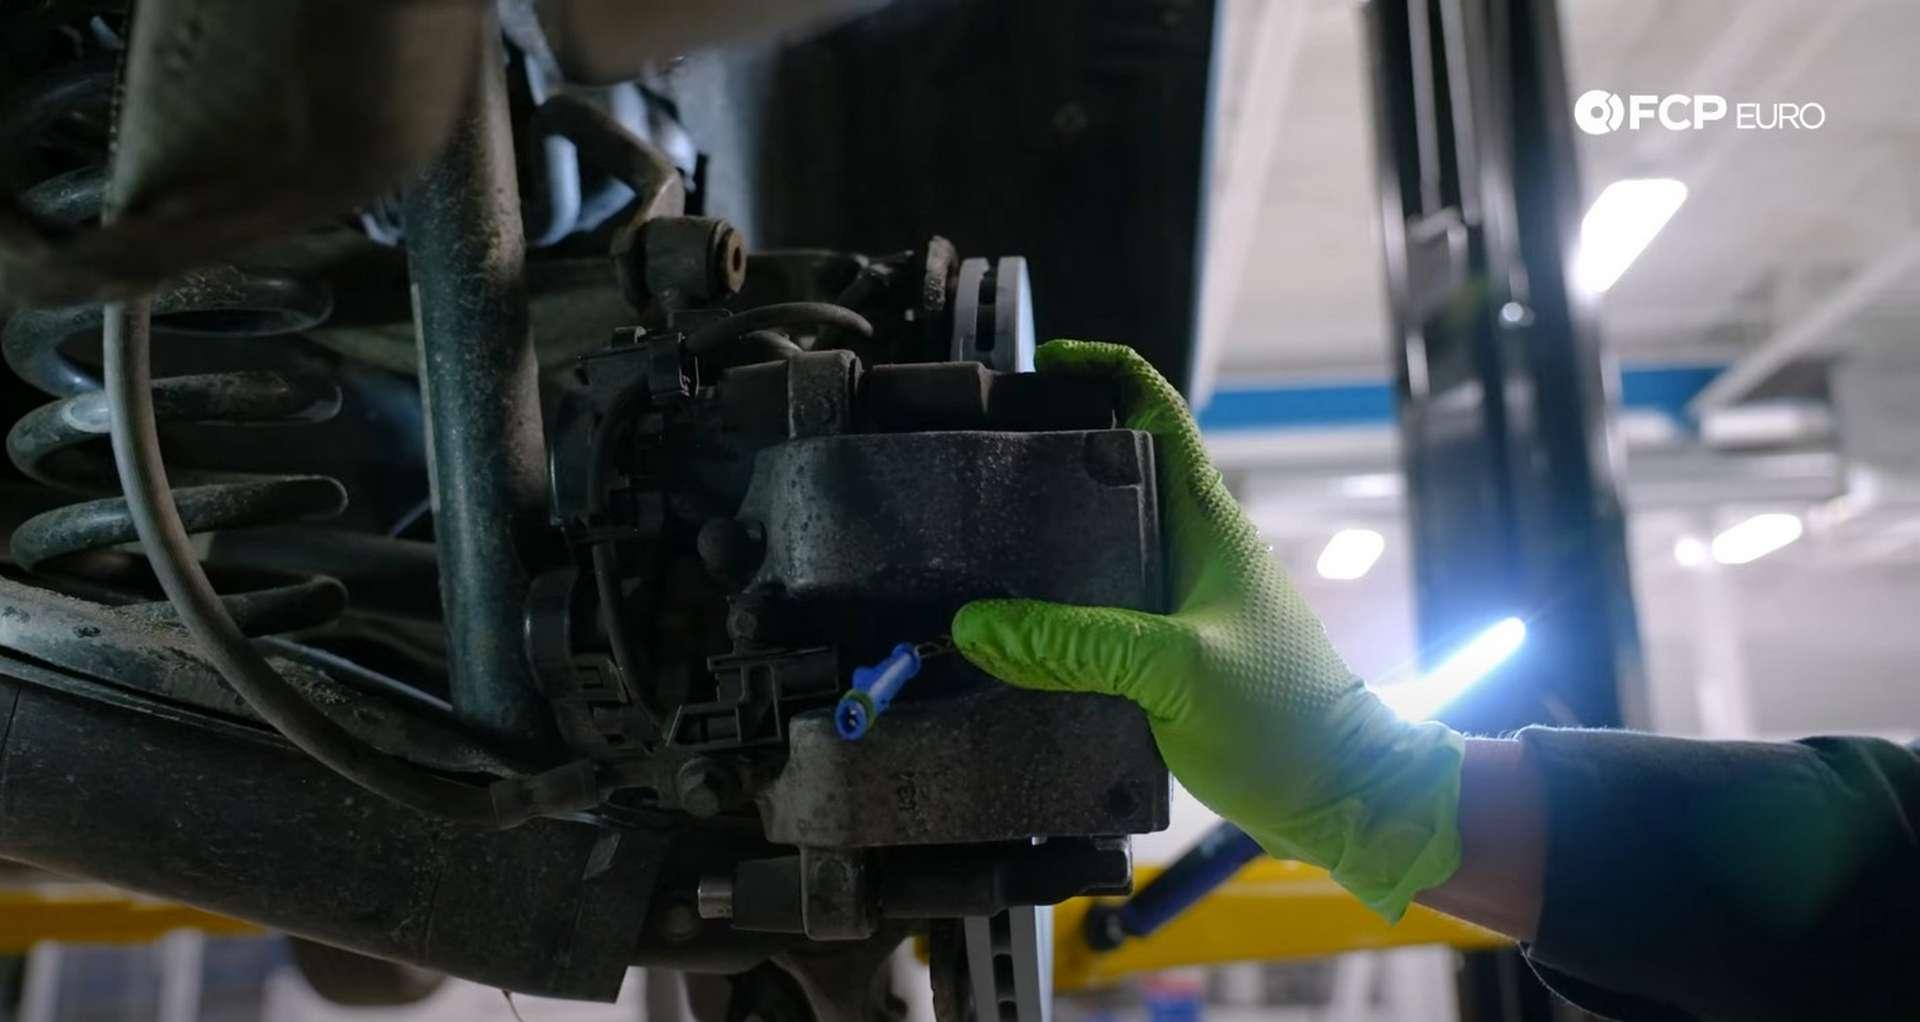 DIY Mercedes W205 Rear Brake Service refitting the caliper